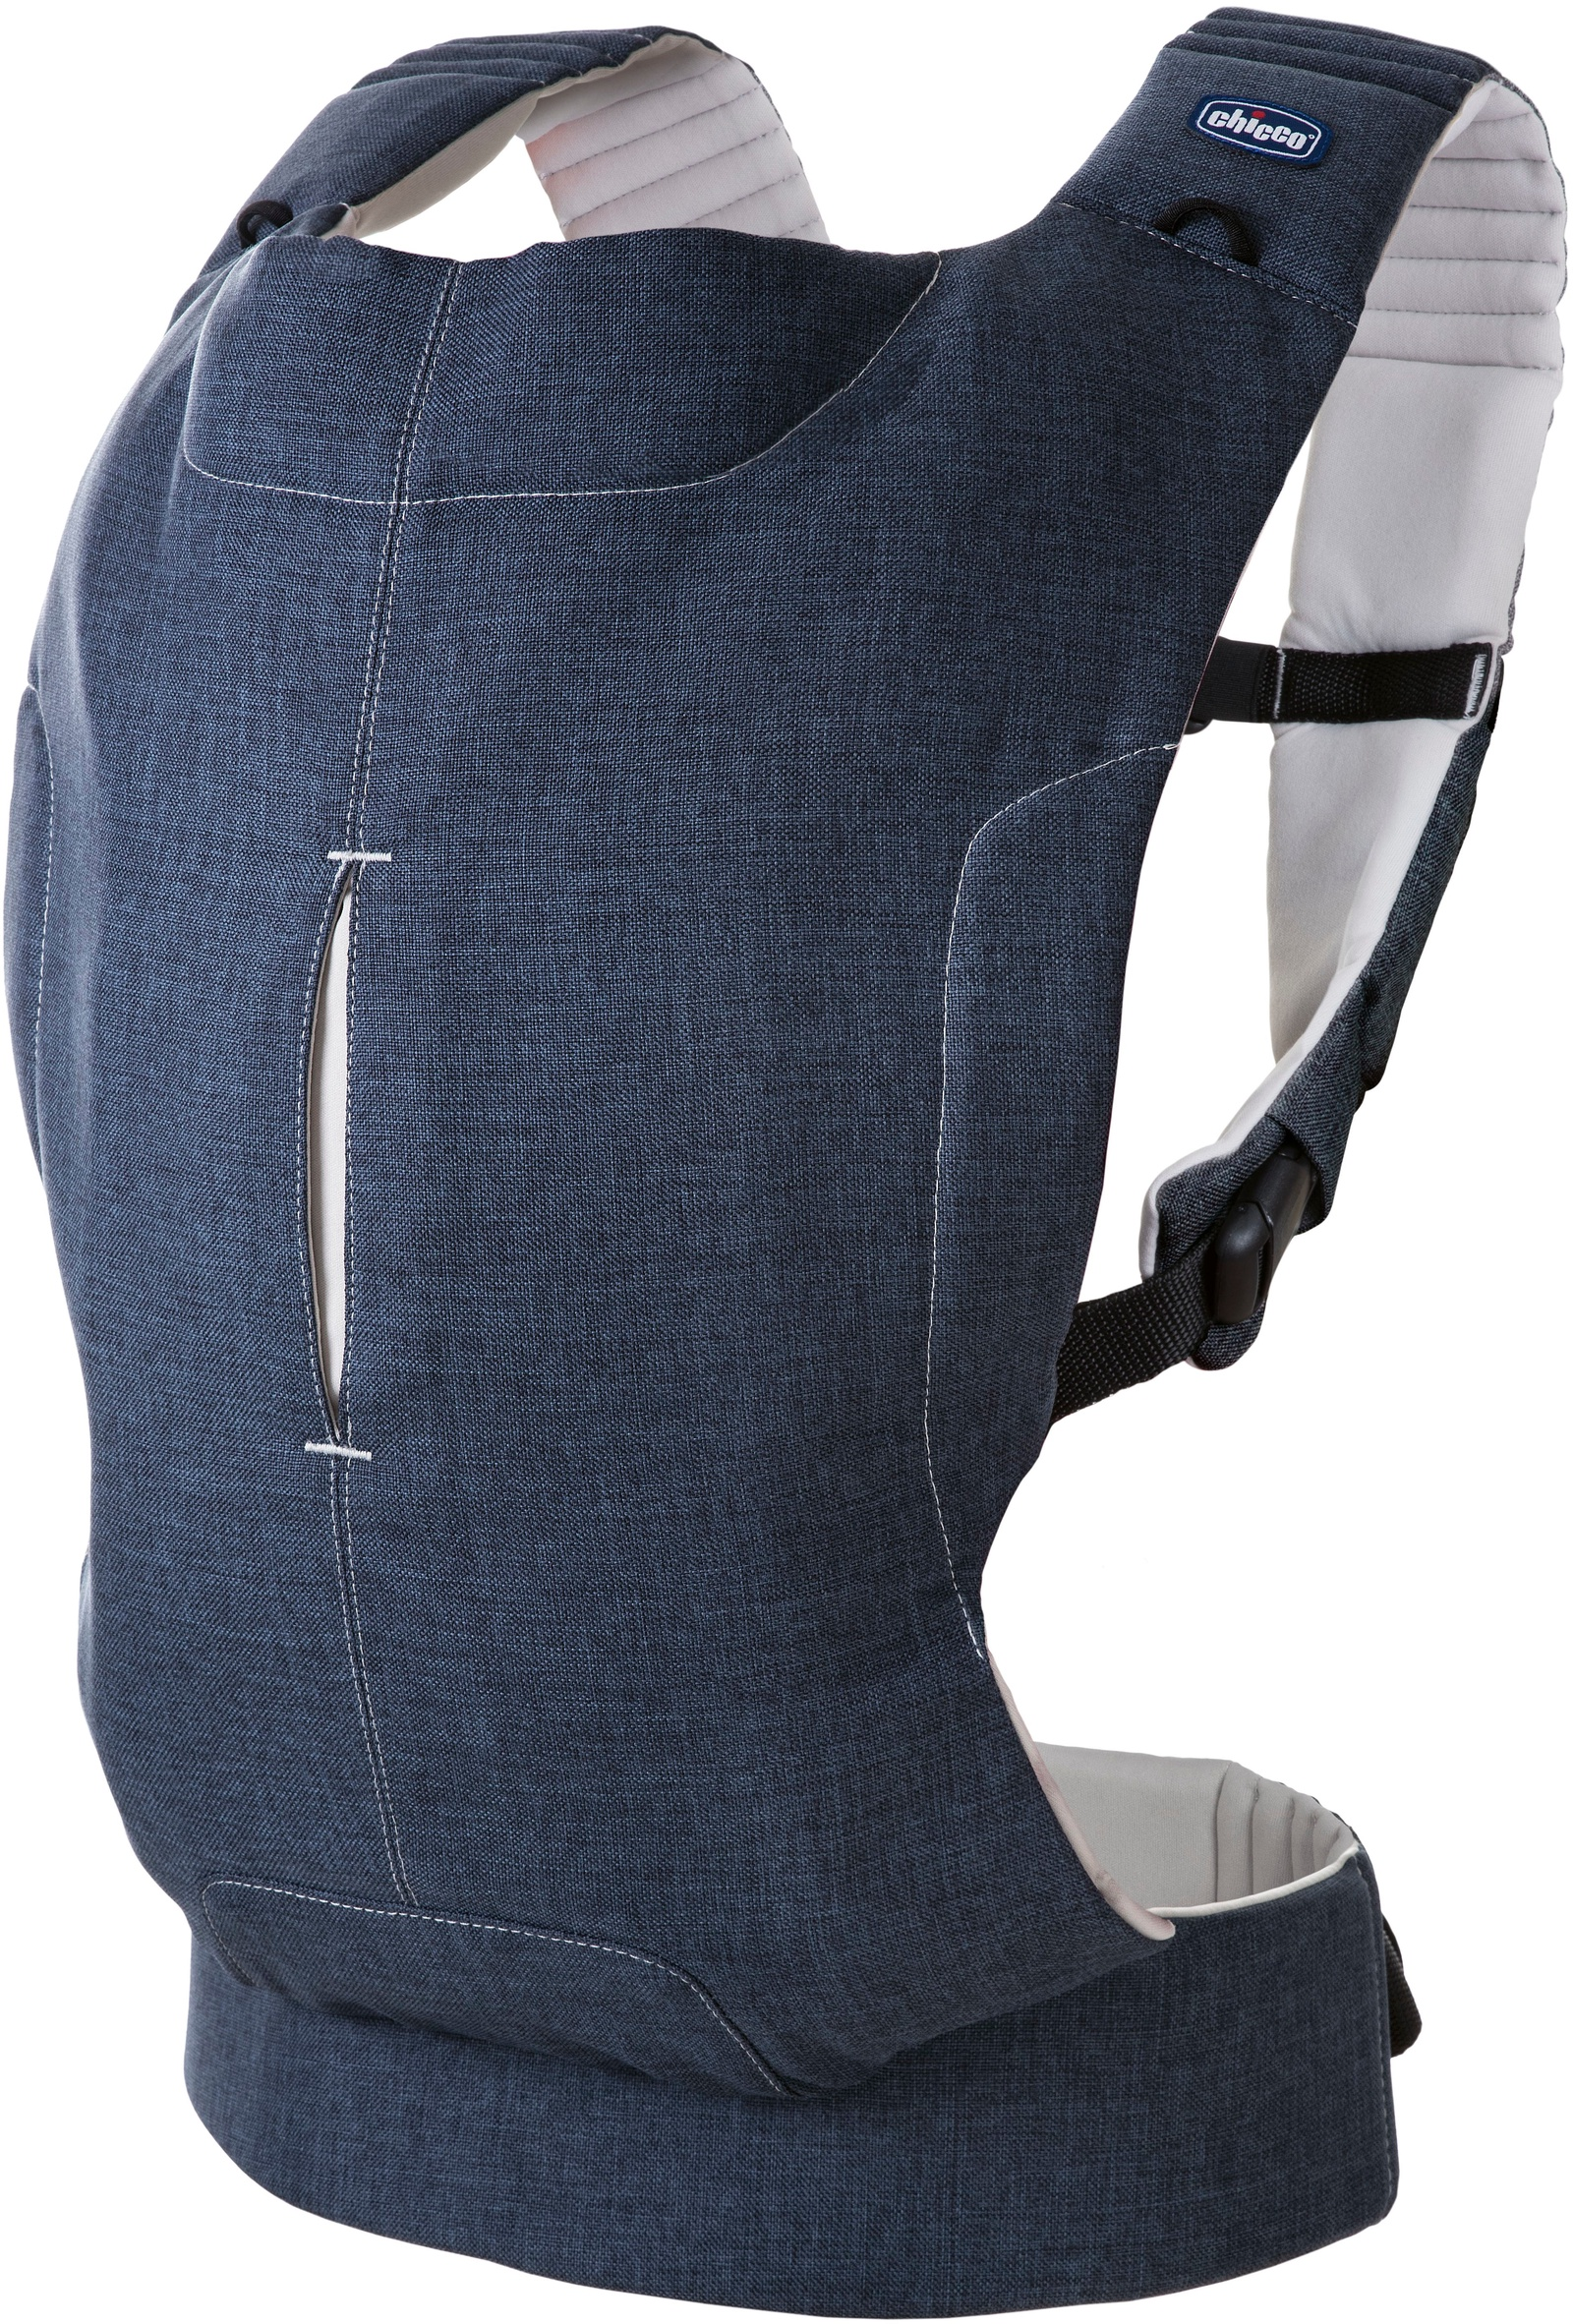 Кенгуру Chicco Myamaki синий chicco рюкзак переноска myamaki complete denim cyclamen